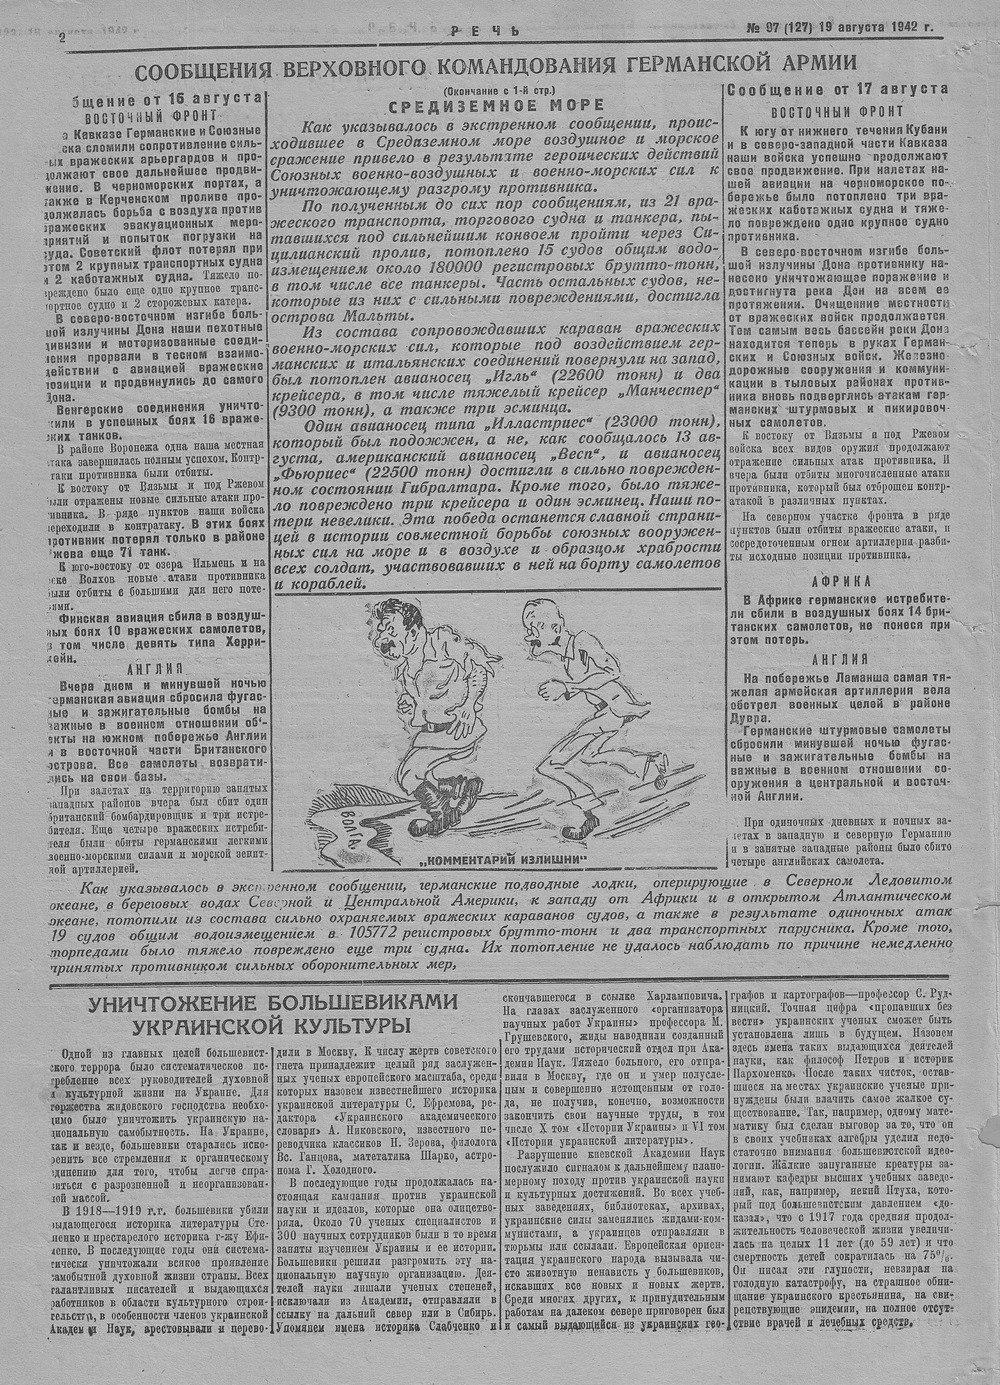 Газета «Речь» Орел №97(127), среда, 19 августа 1942 года